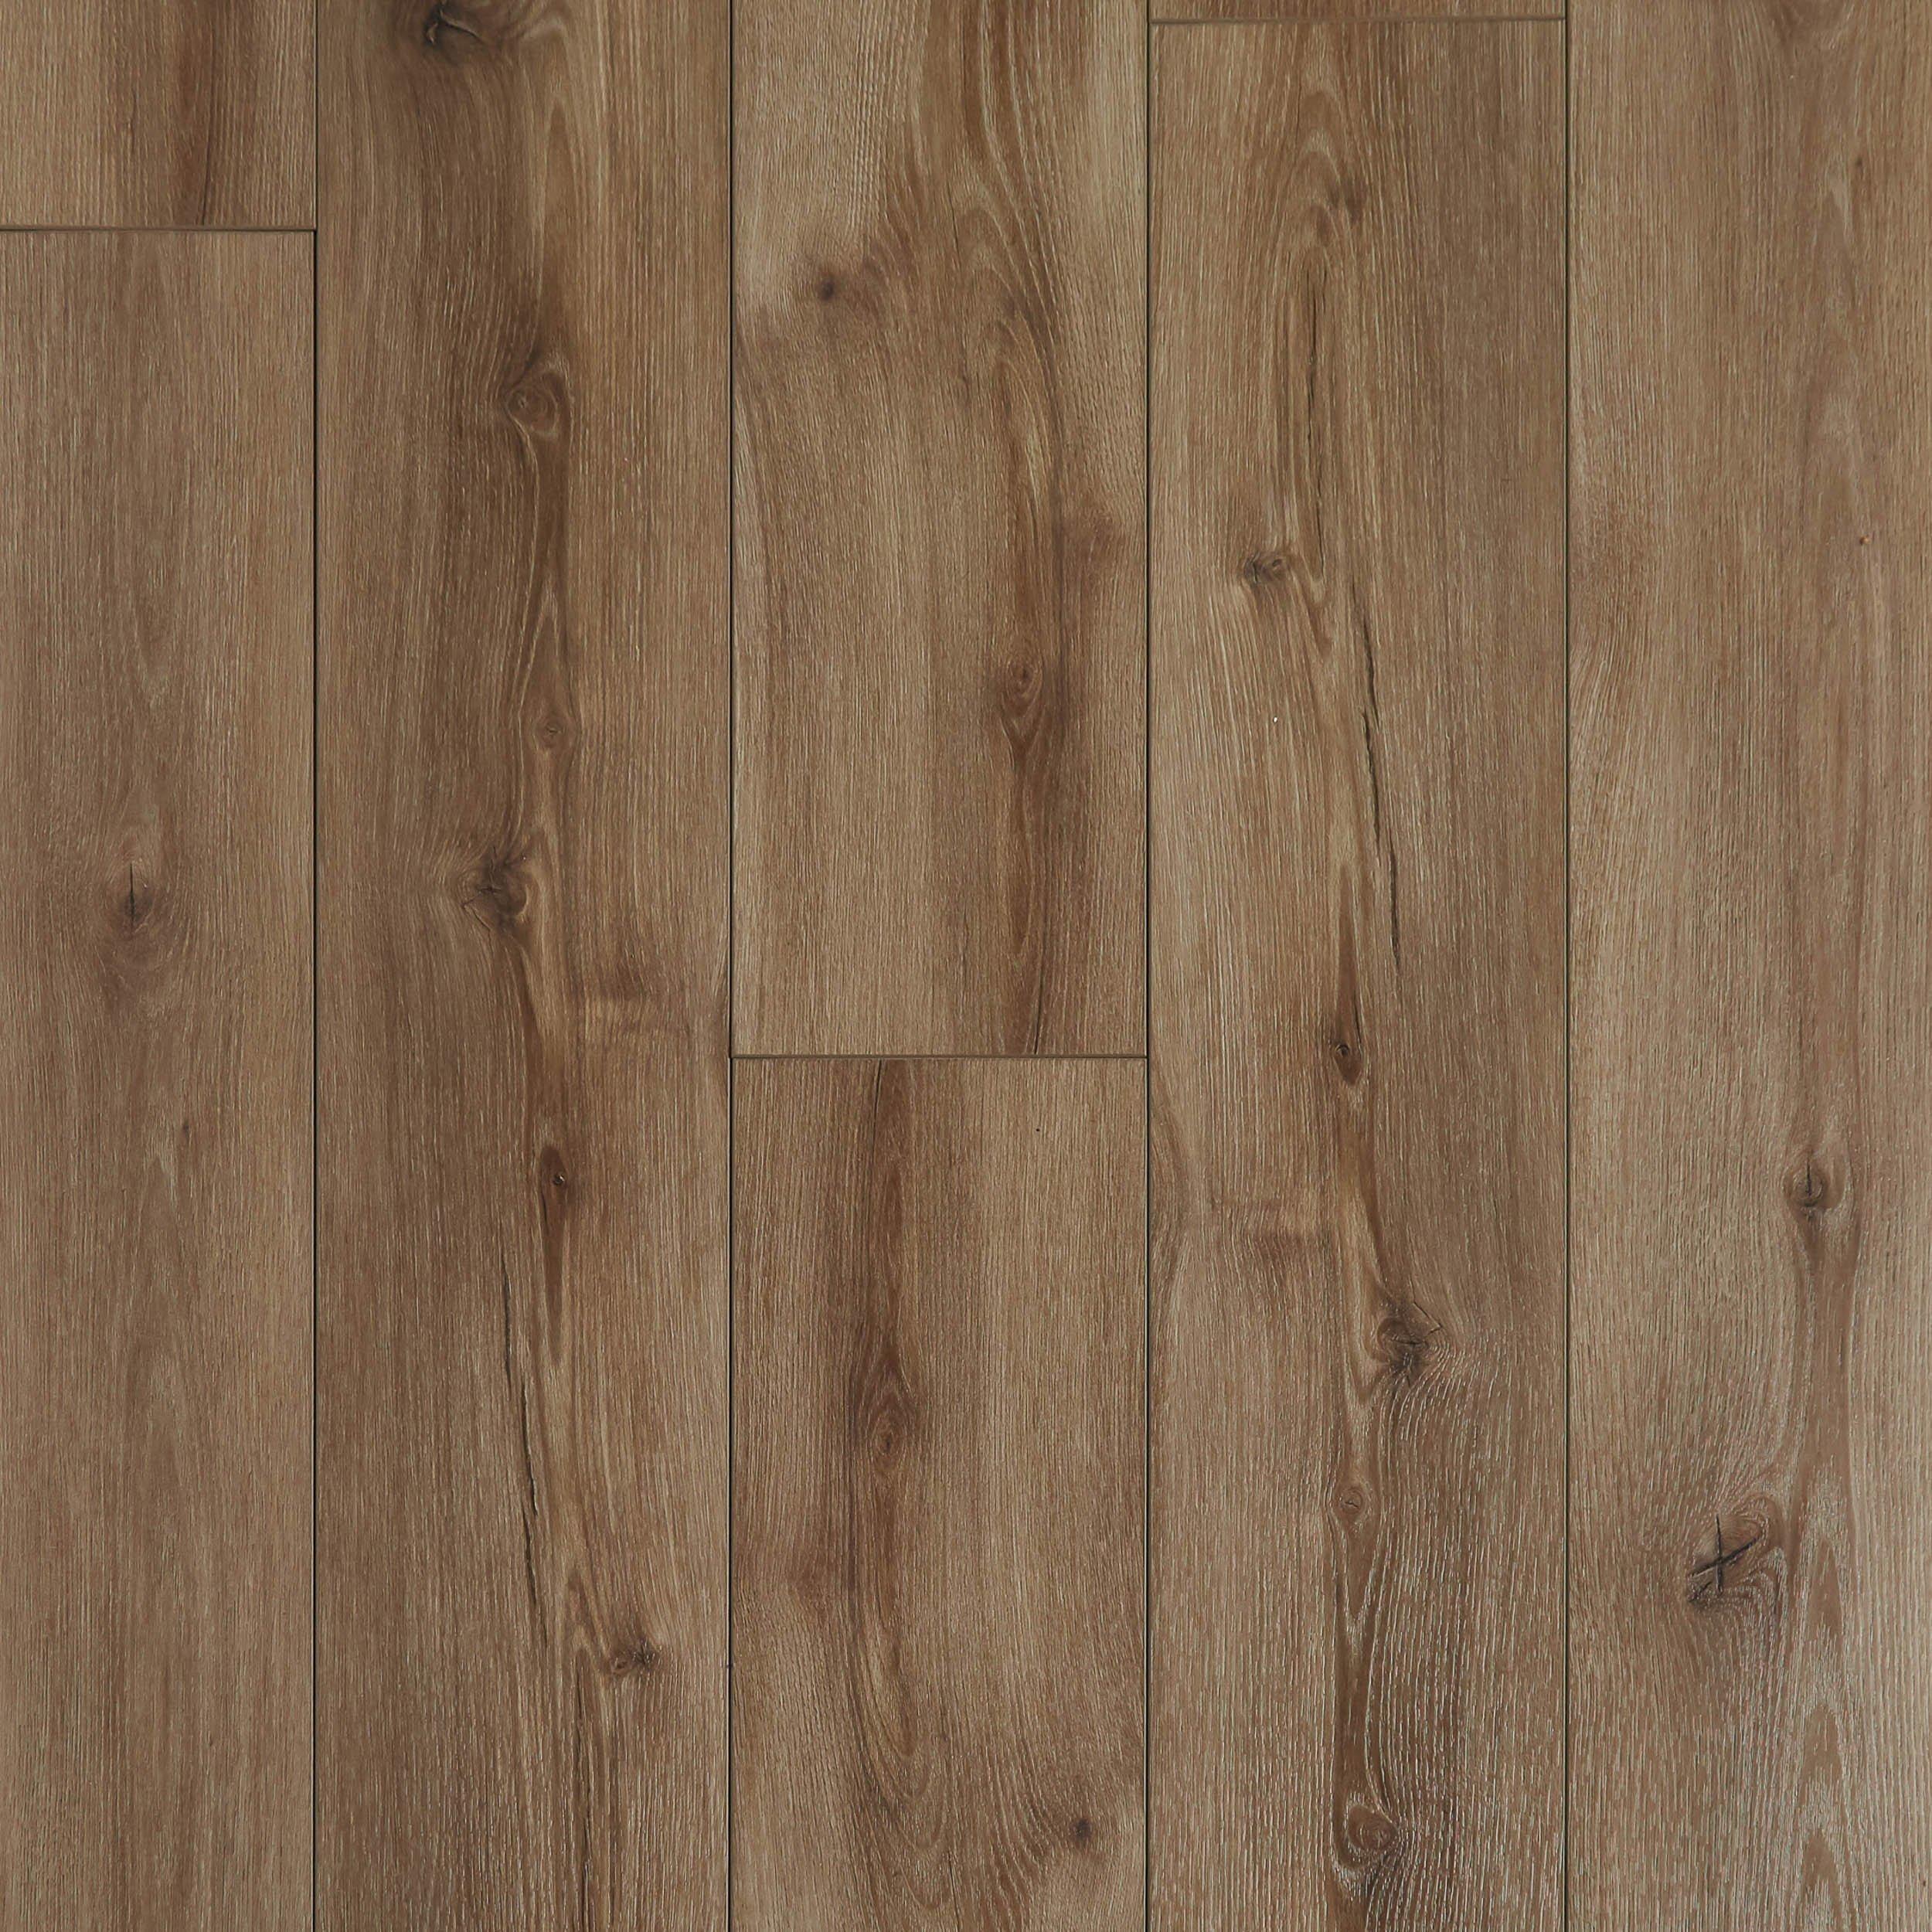 Woodsmoke Rigid Core Luxury Vinyl Plank Cork Back Luxury